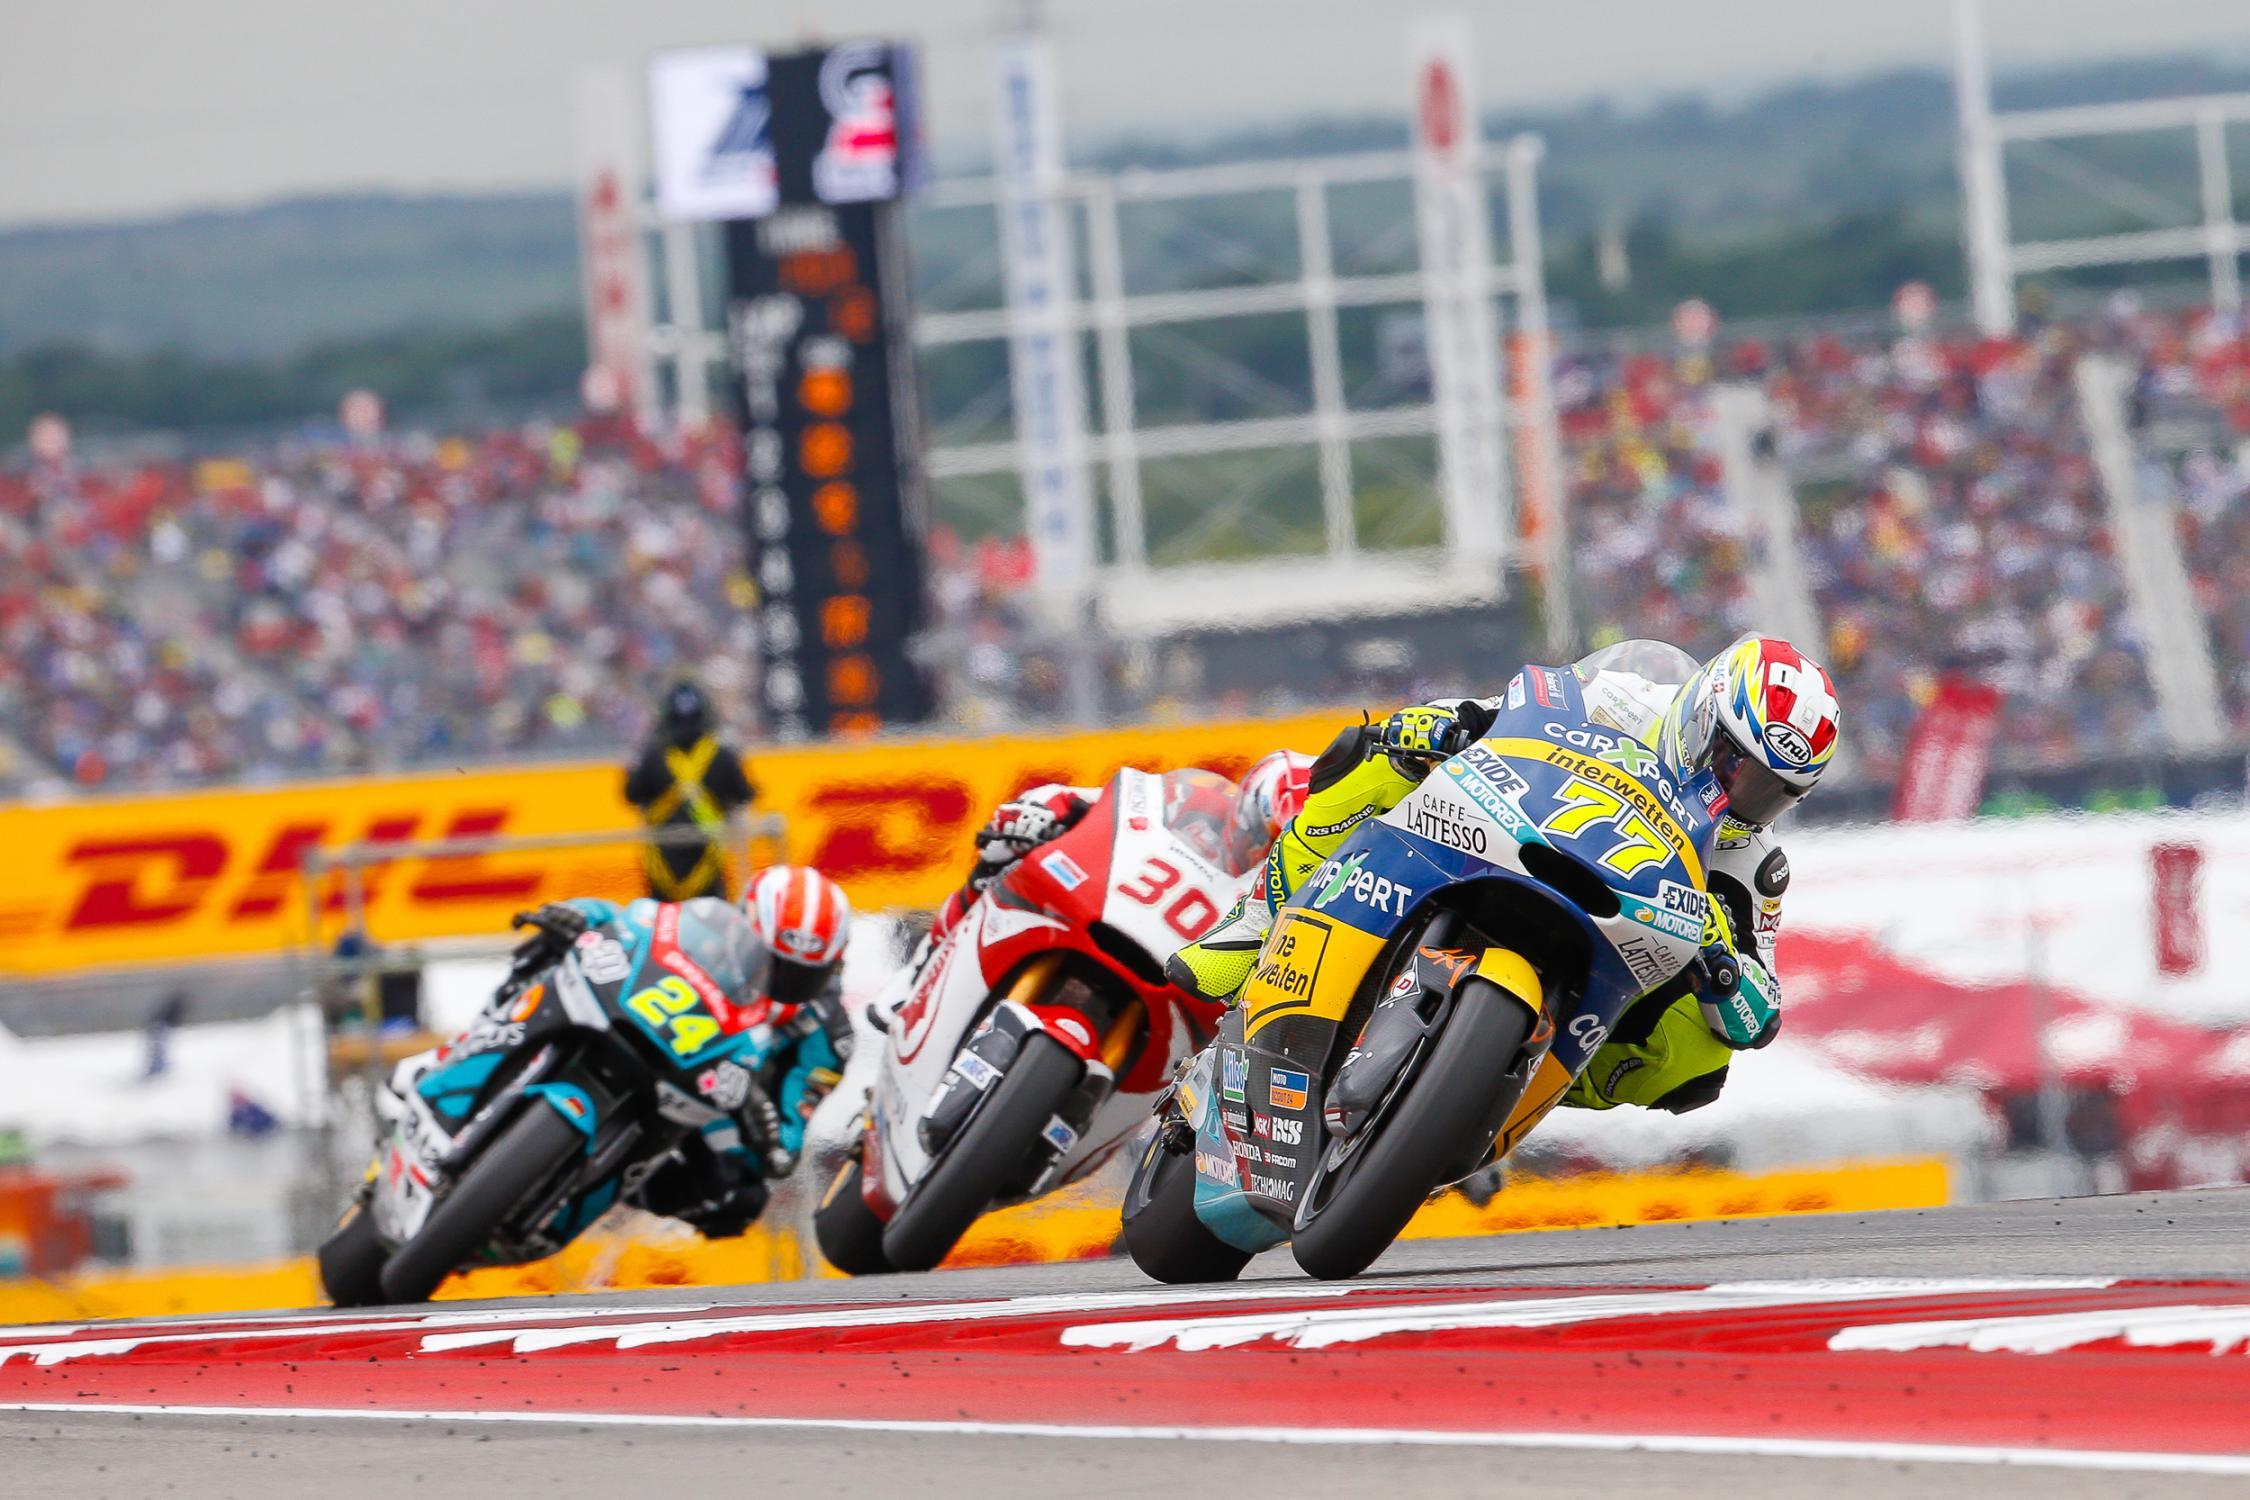 austin16_moto2_briga_pelo_podio